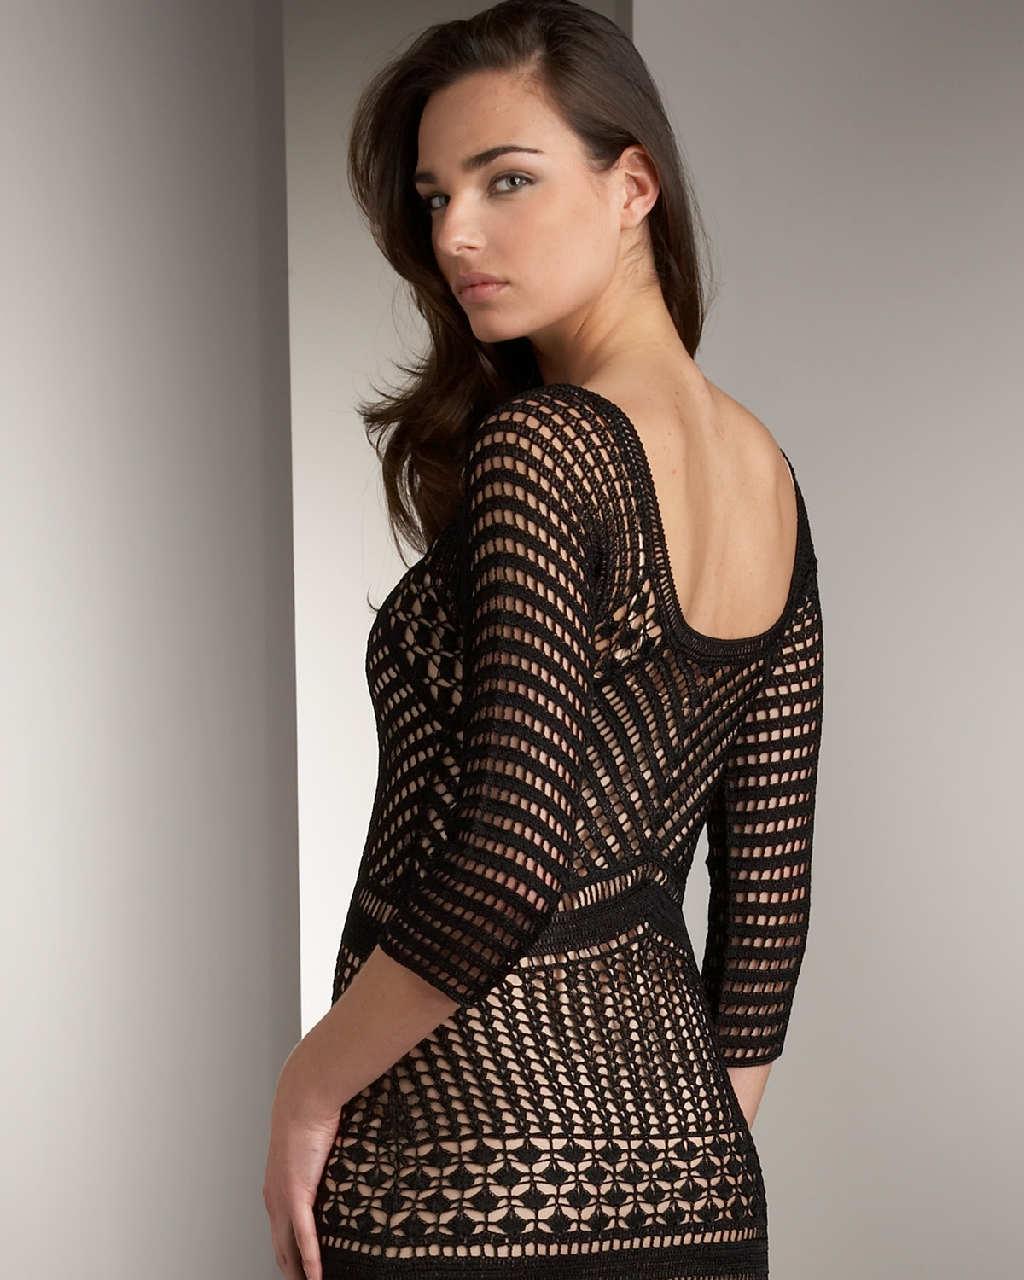 Black dress neiman marcus - Neiman Marcus Black Dress